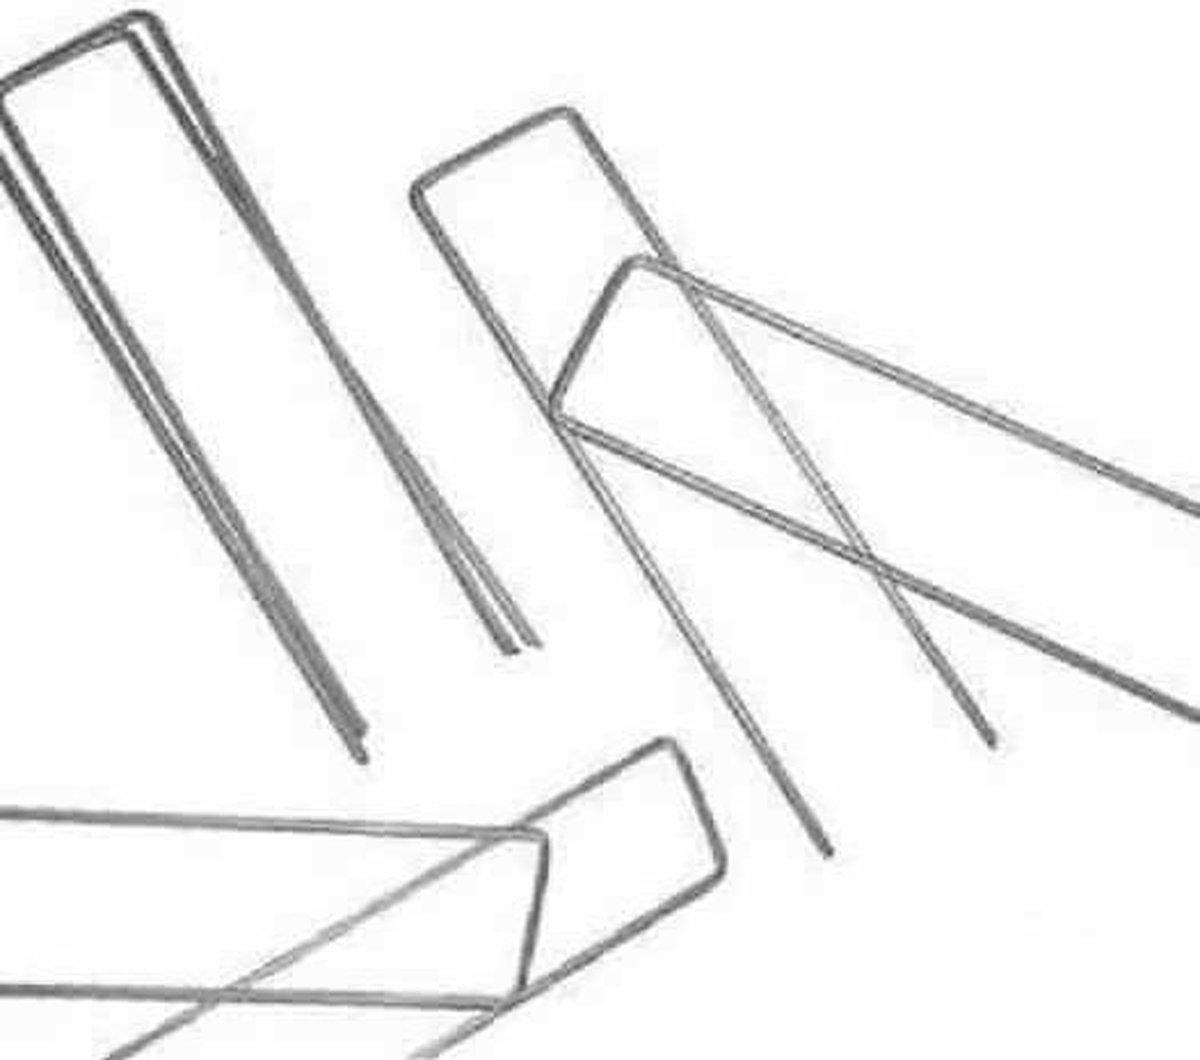 kunstgraspennen, gronddoekpennen, gronddoekpennen, antiworteldoek pennen, 10 st , 20 x 5 x 20 cm